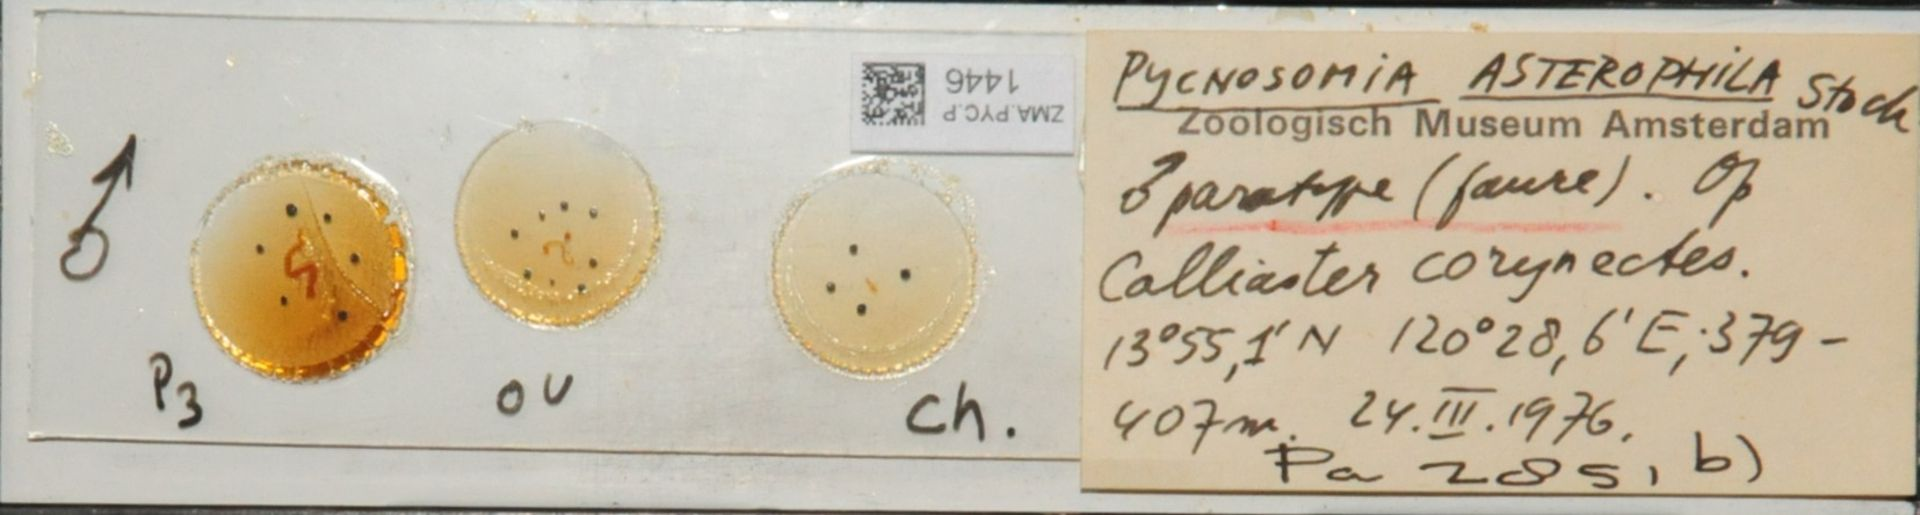 ZMA.PYC.P.1446 | Pycnosomia asterophila Stock